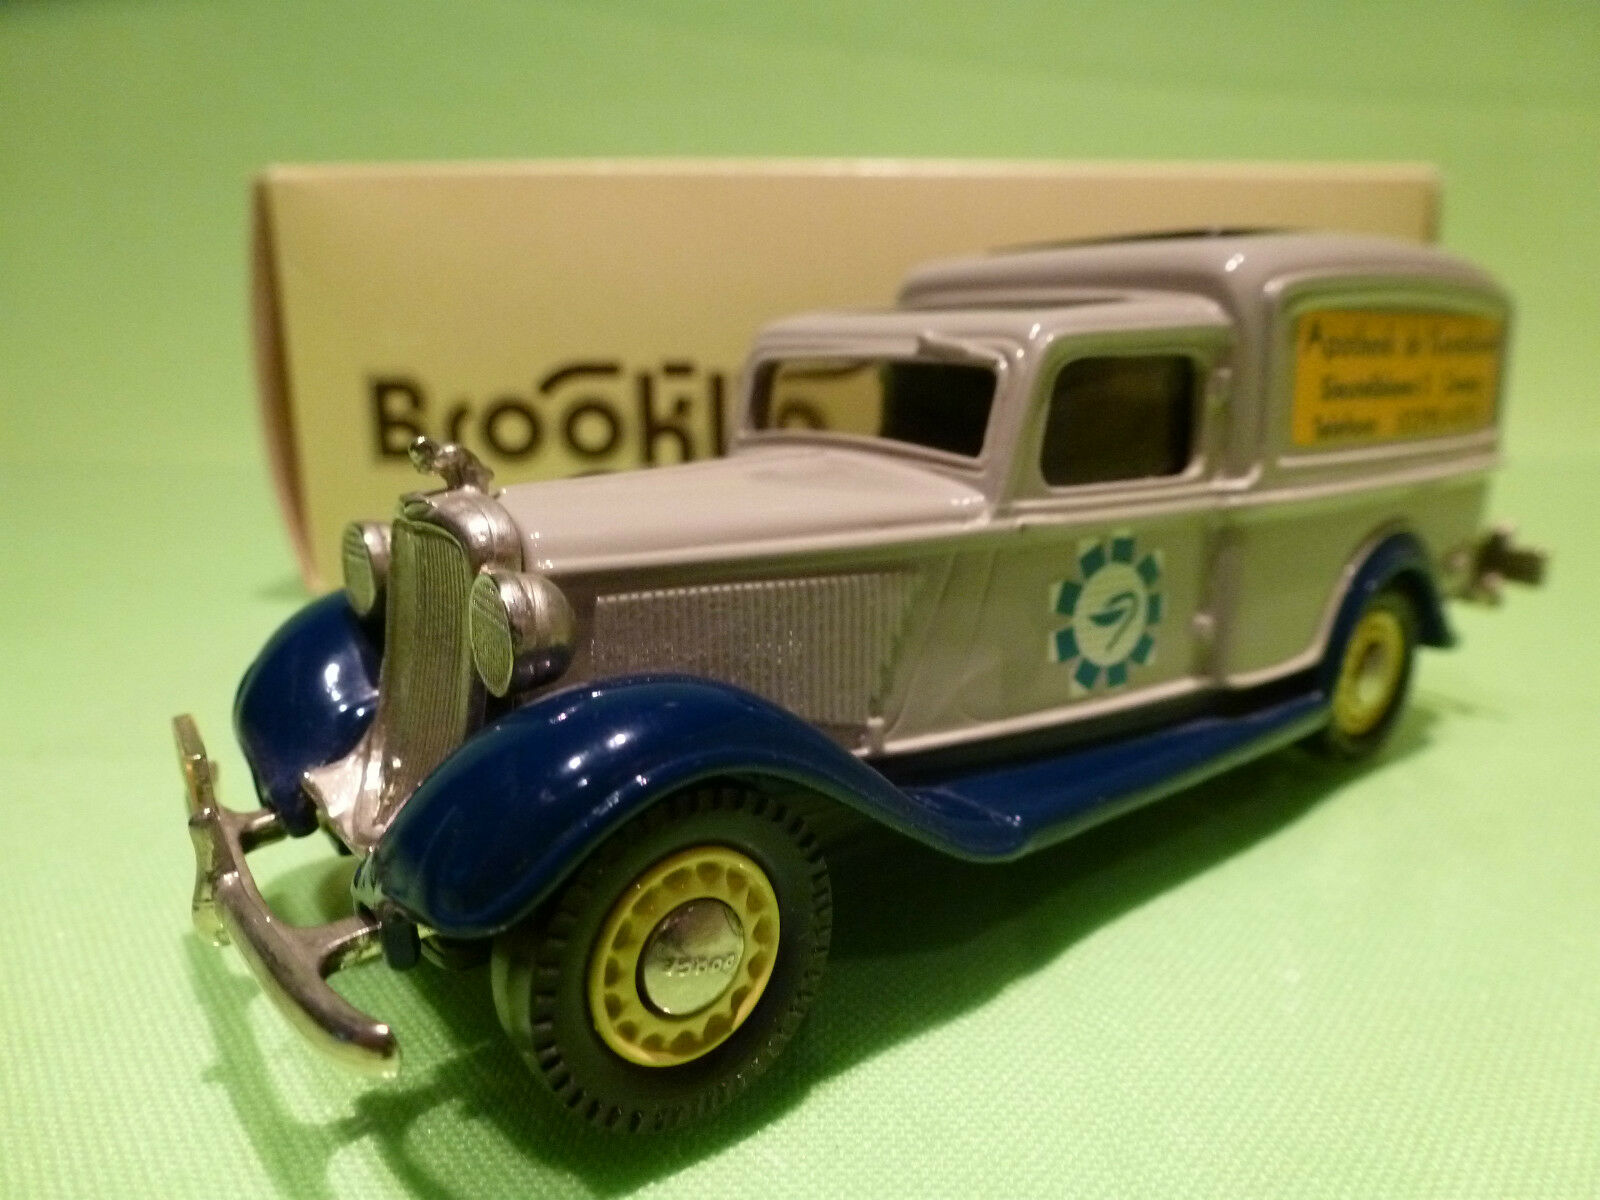 Brooklin modelle brk - 16x dodge van 1938 - apotheek korenbloem - 1 43 - nmib